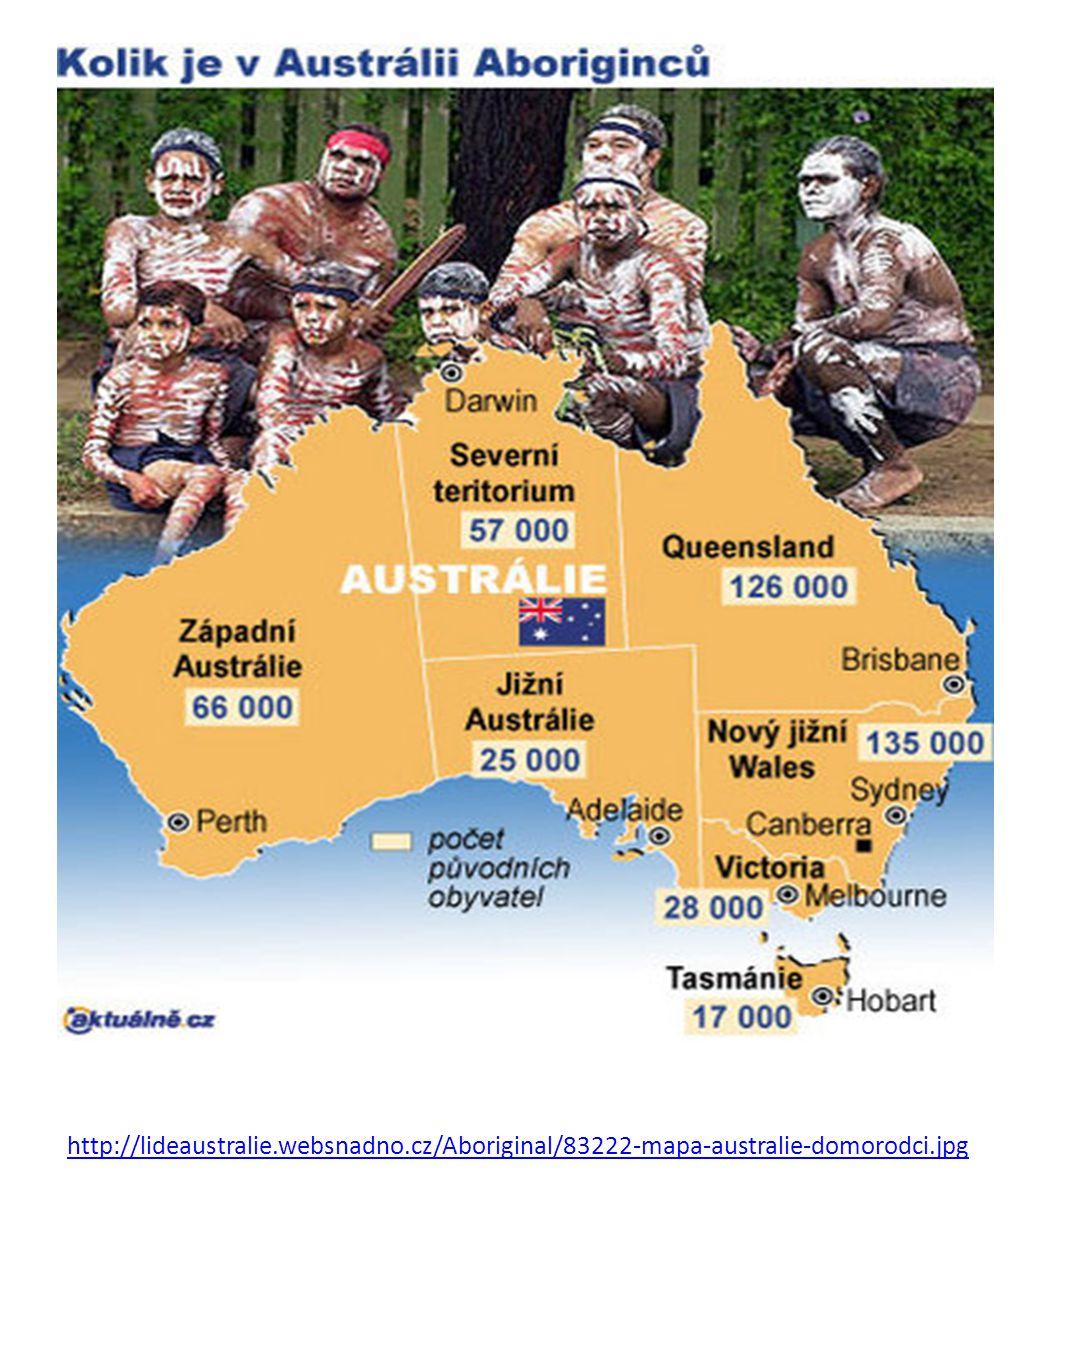 http://lideaustralie.websnadno.cz/Aboriginal/83222-mapa-australie-domorodci.jpg